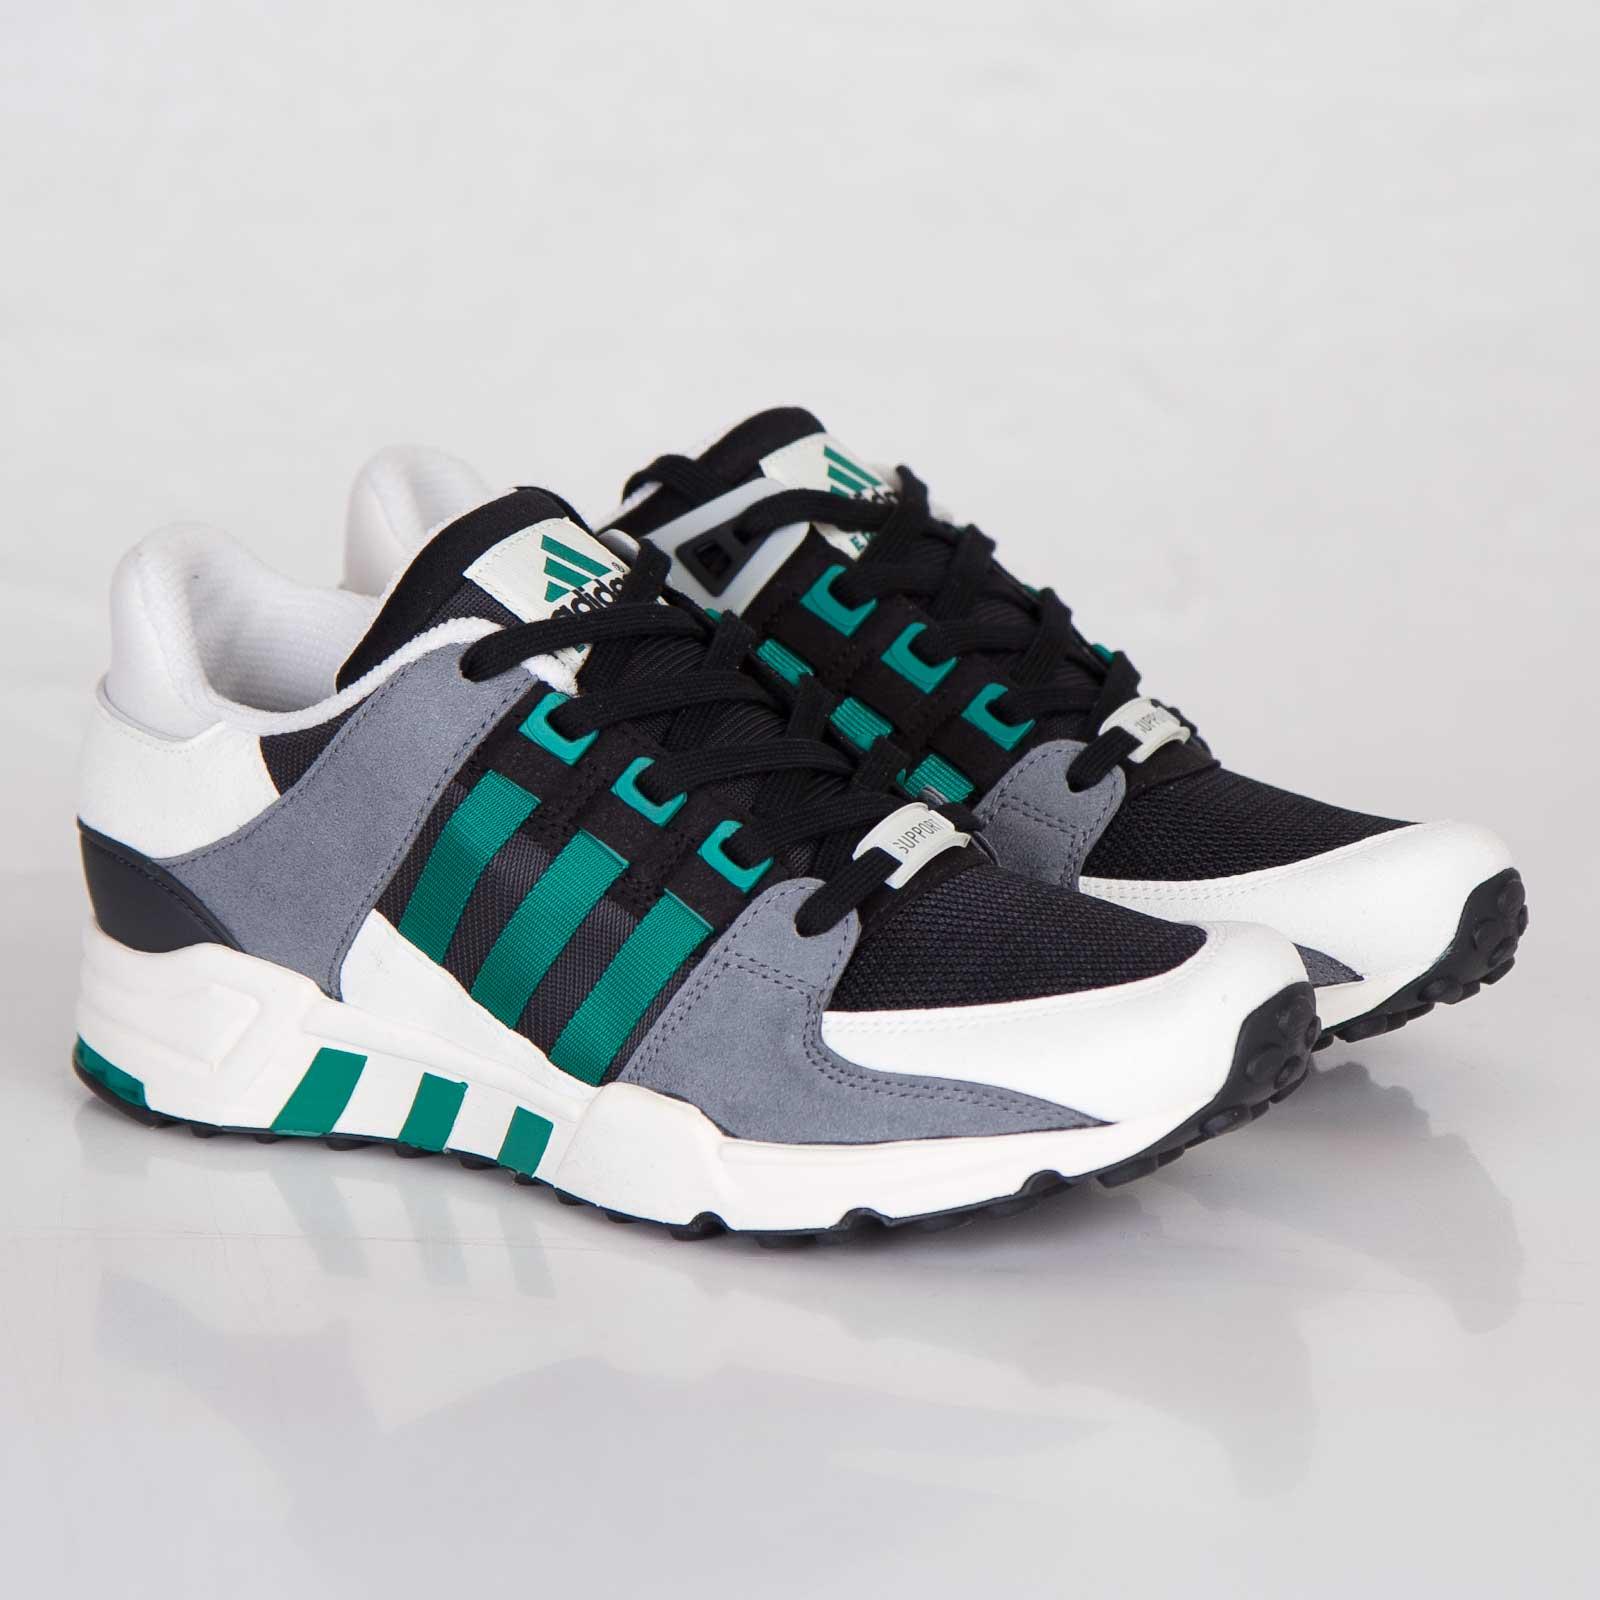 new arrival 7048c a62c4 adidas EQT Running Support - D67729 - Sneakersnstuff ...